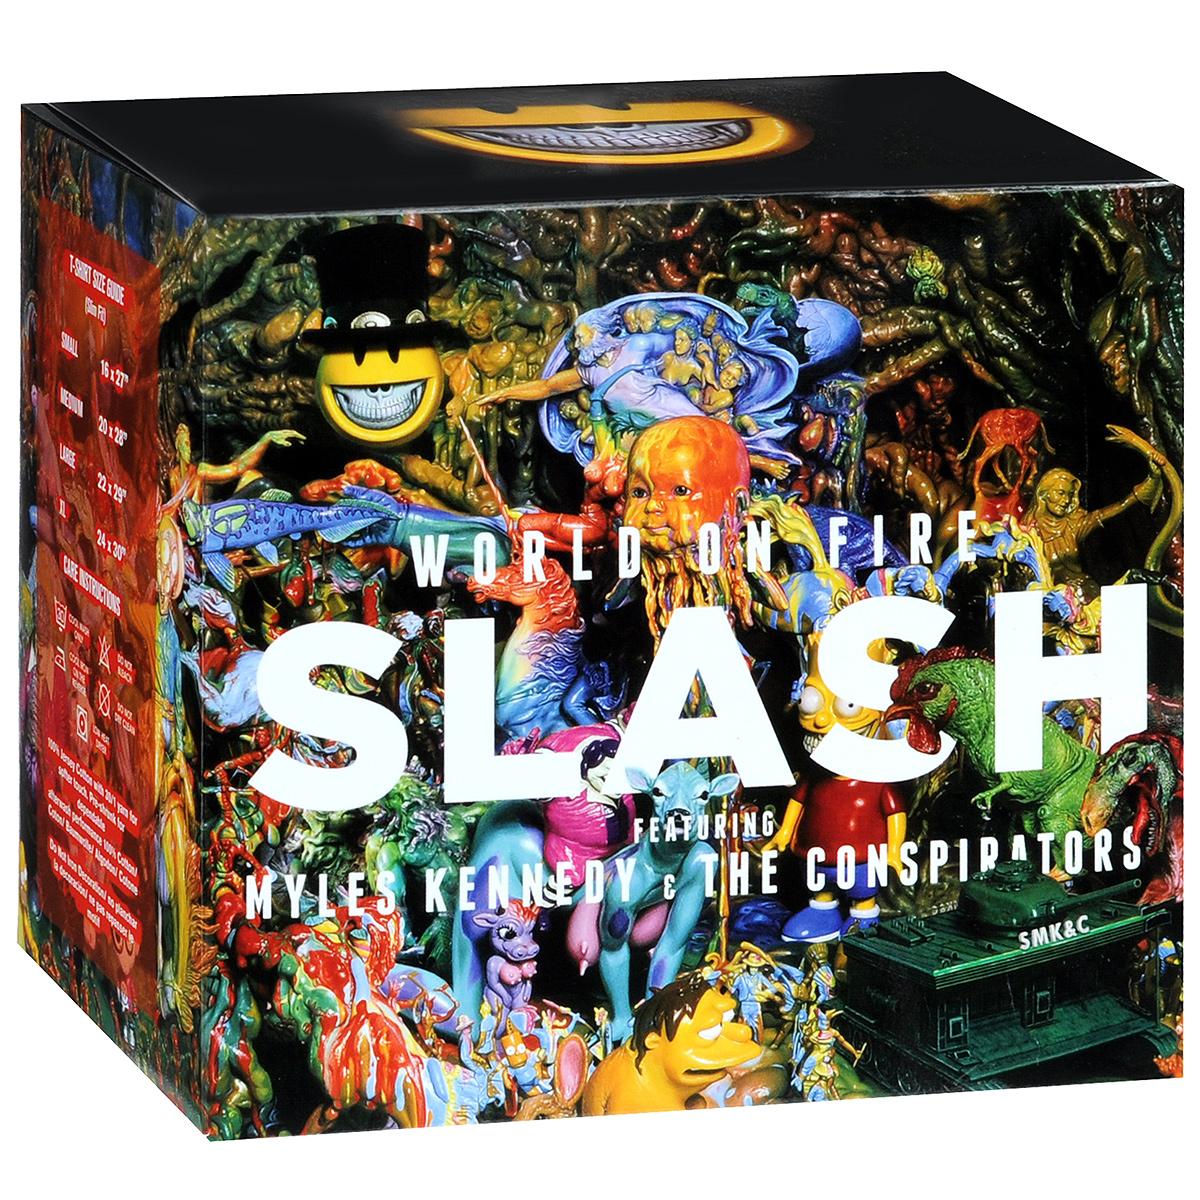 Slash,Майлс Кеннеди,The Conspirators Slash. Featuring Myles Kennedy And The Conspirators. World on Fire (S) slash slash world on fire 2 lp